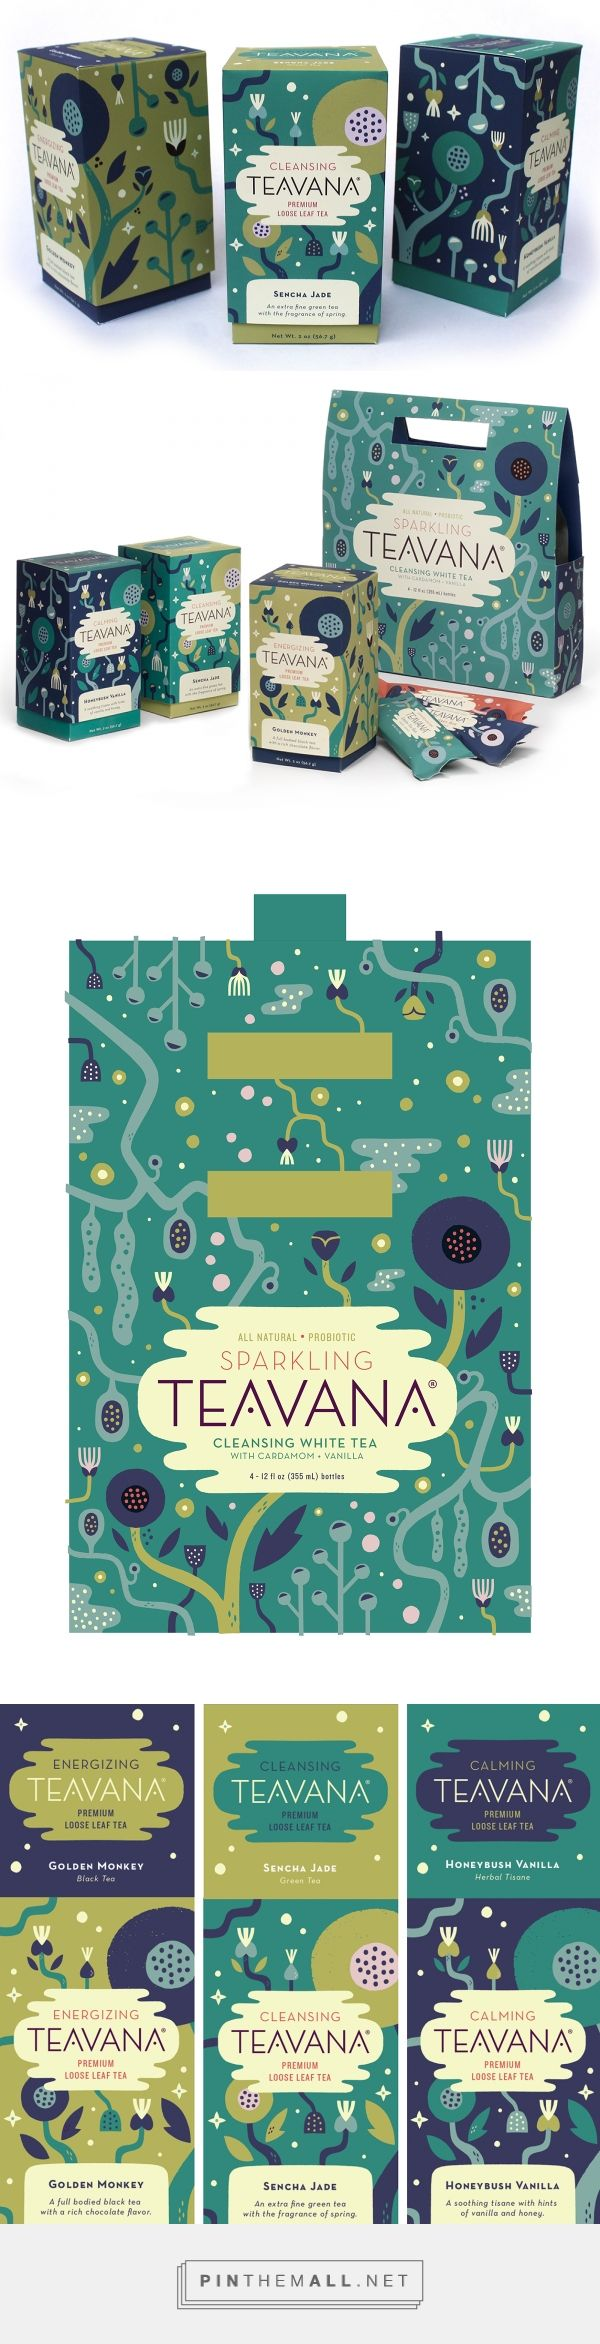 Wonderful calming colors and illustration style! Teavana Tea Rebrand by Alexander Vidal